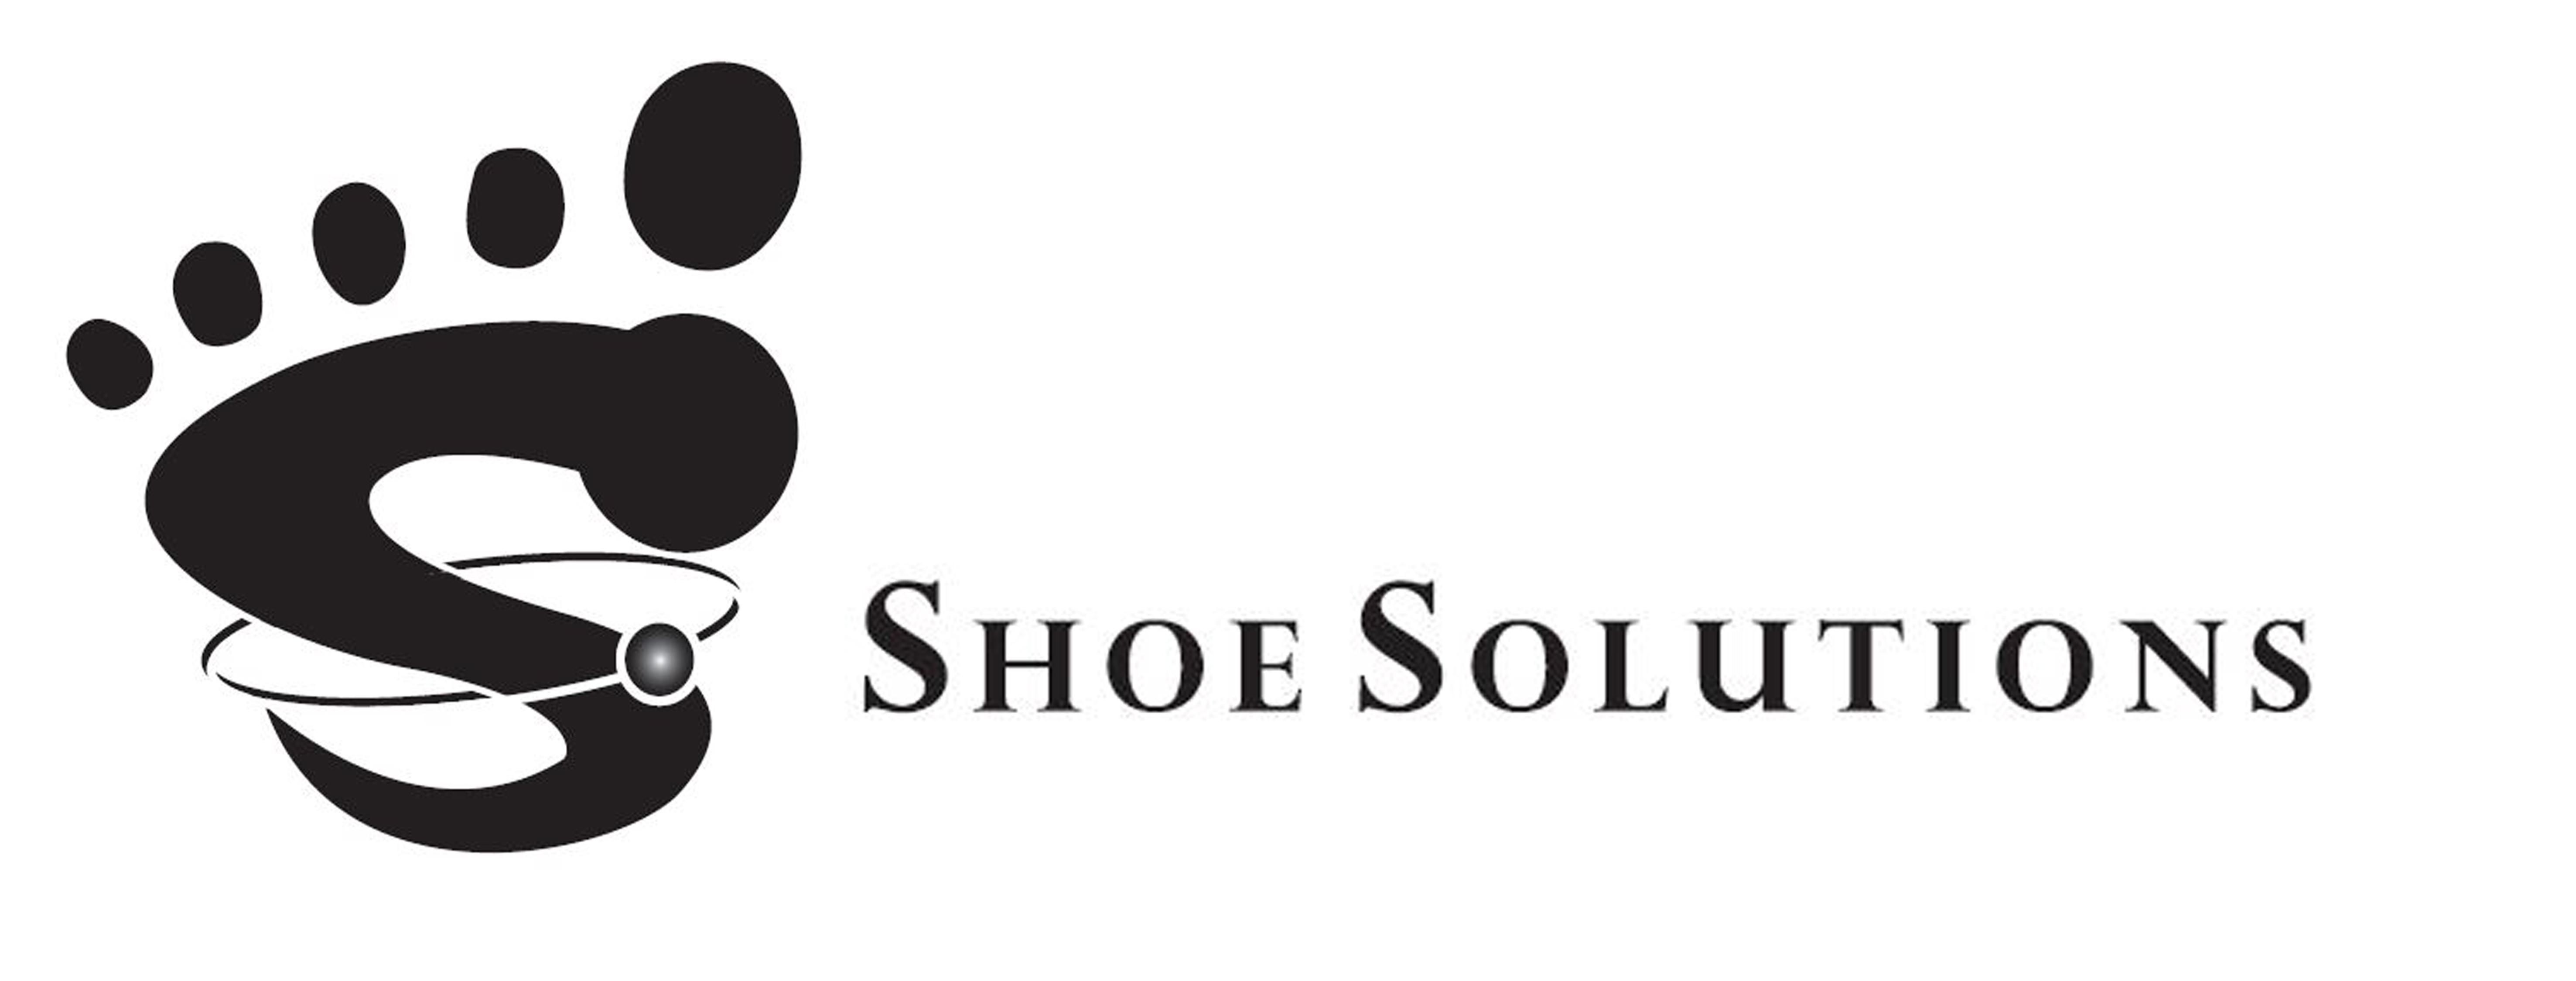 Shoe Solutions